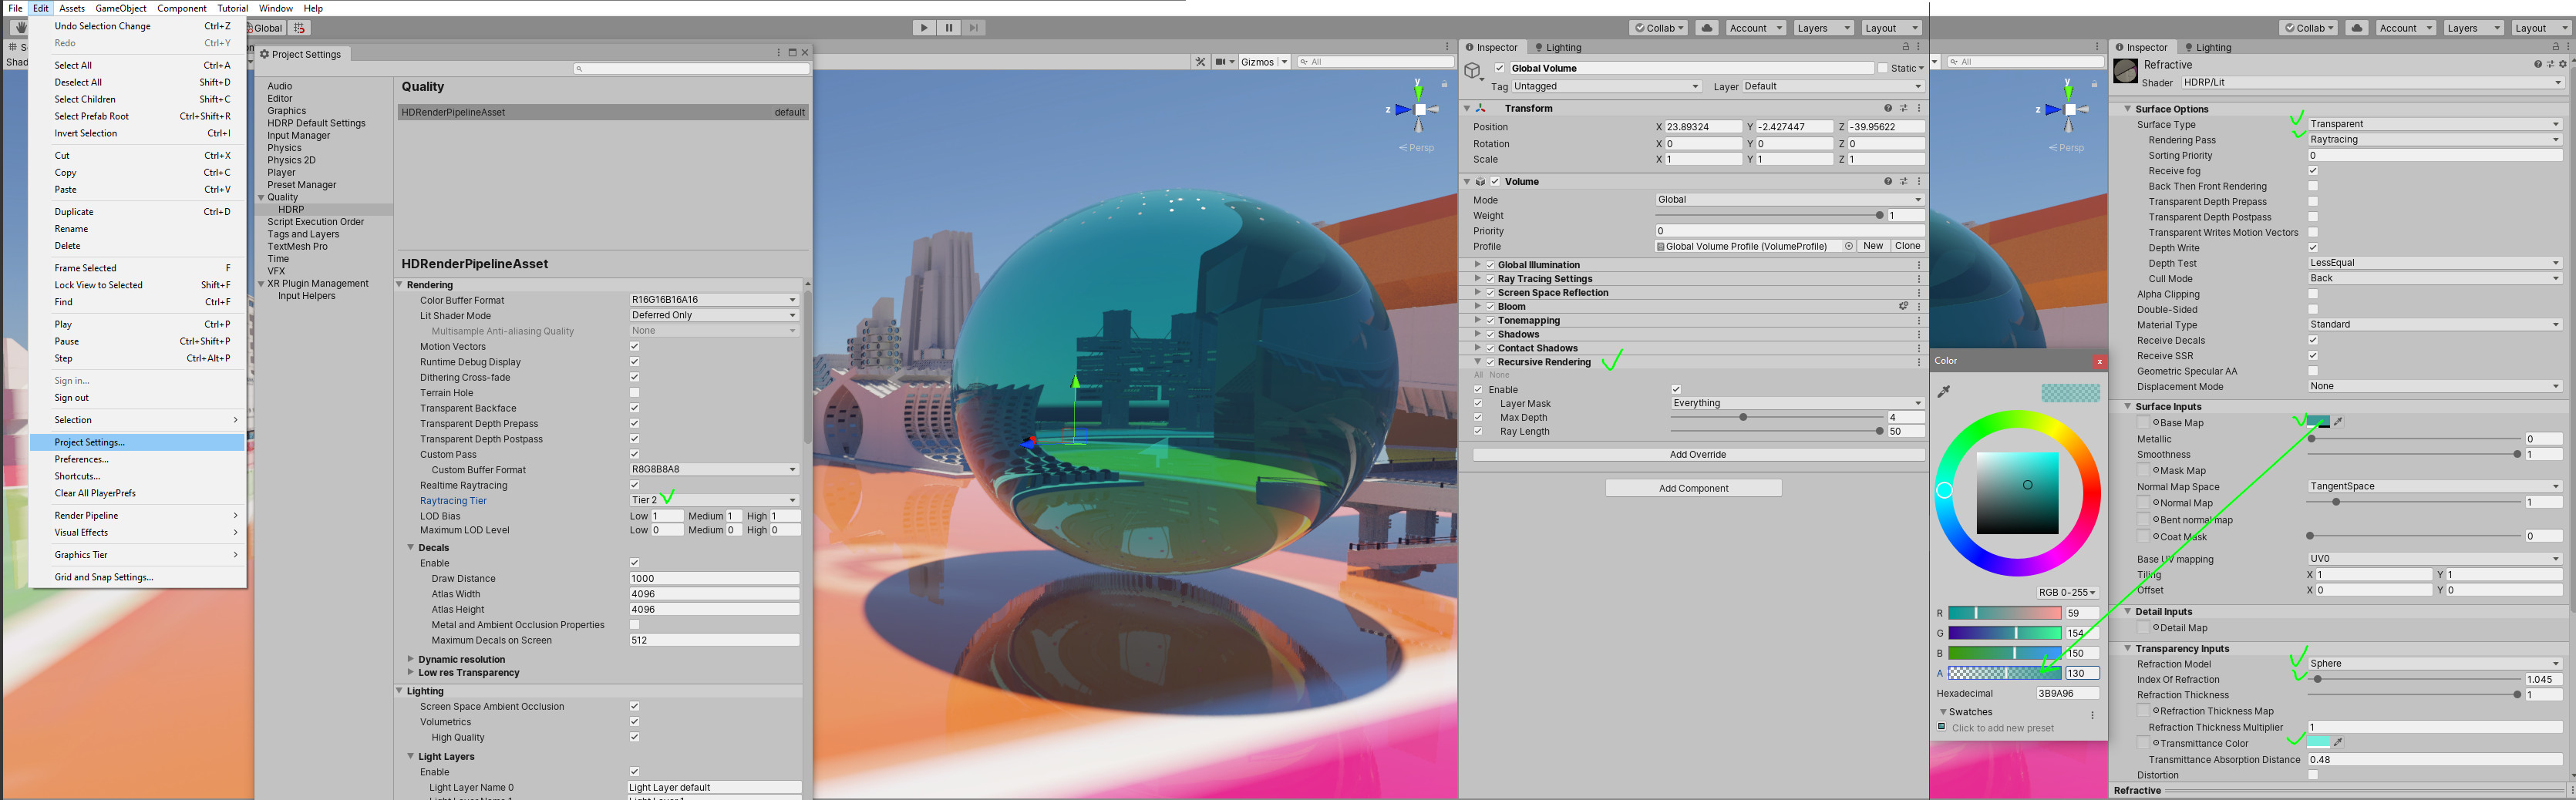 Transparency tier 2 setup.jpg